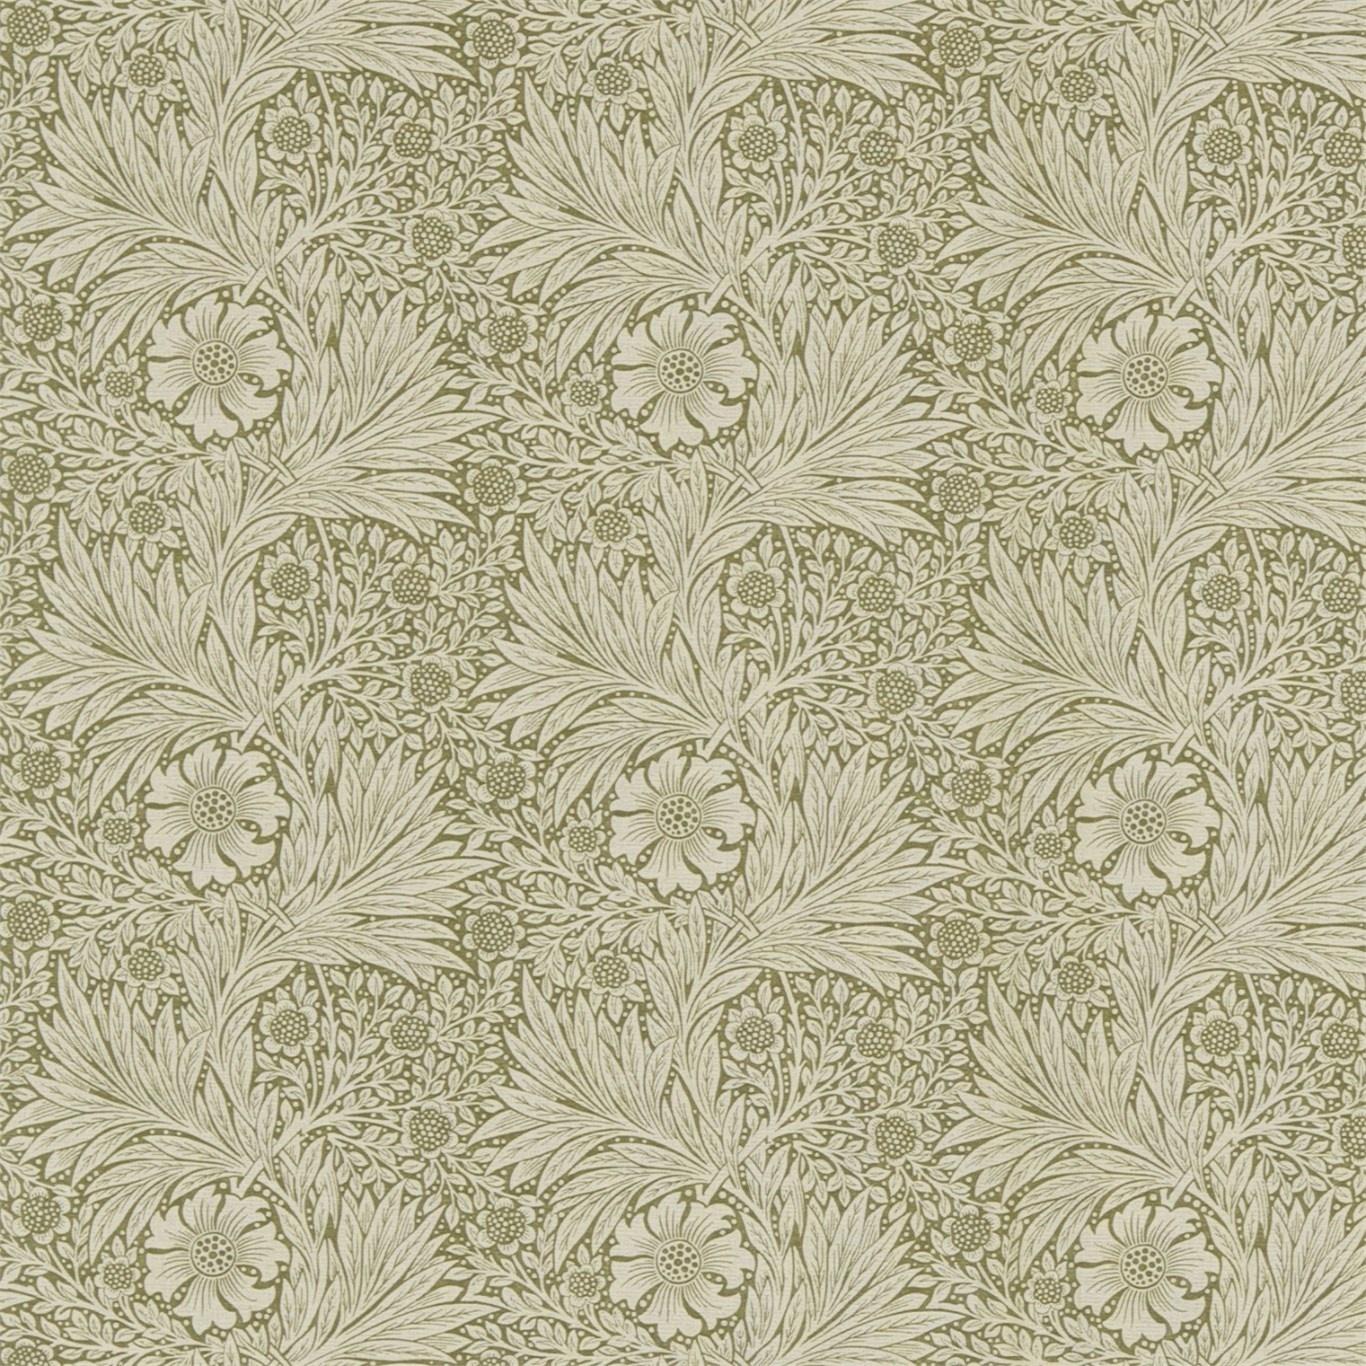 Image of Morris & Co Marigold Olive/Linen Fabric 220318 3m Remnant